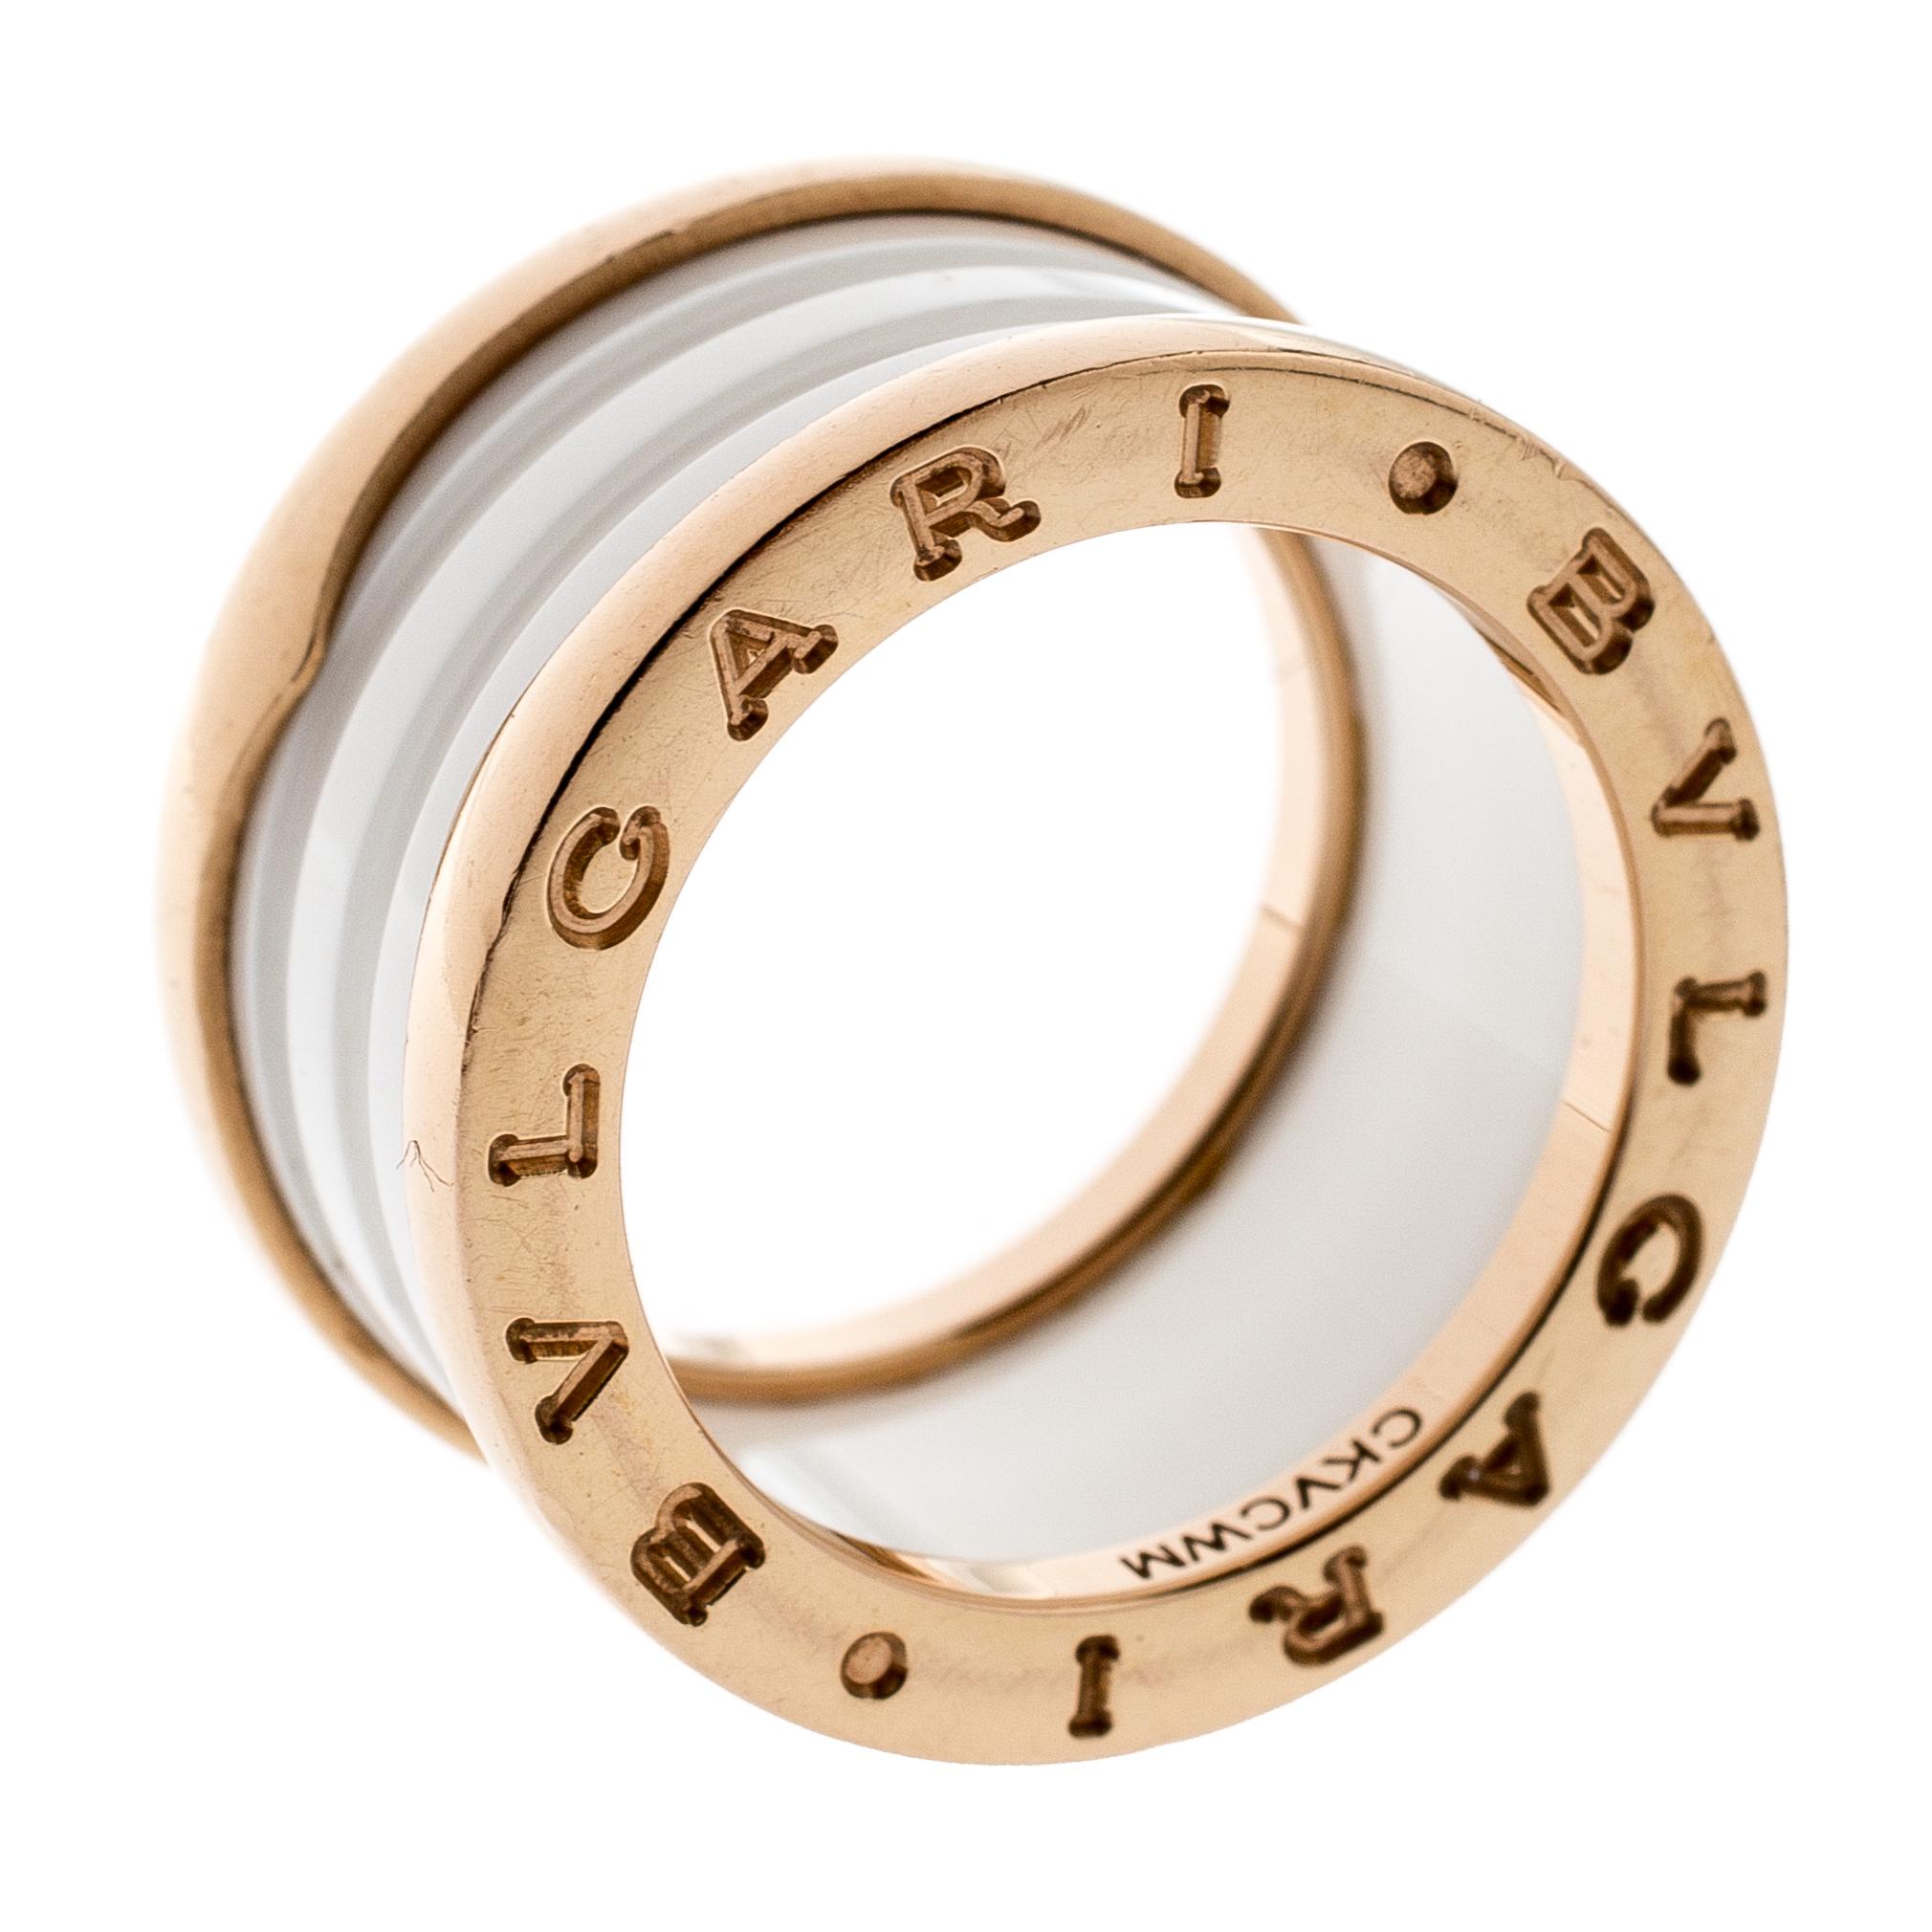 aee307cb4 Buy Bvlgari B.Zero1 4 Band White Ceramic 18k Rose Gold Ring Size 51 ...